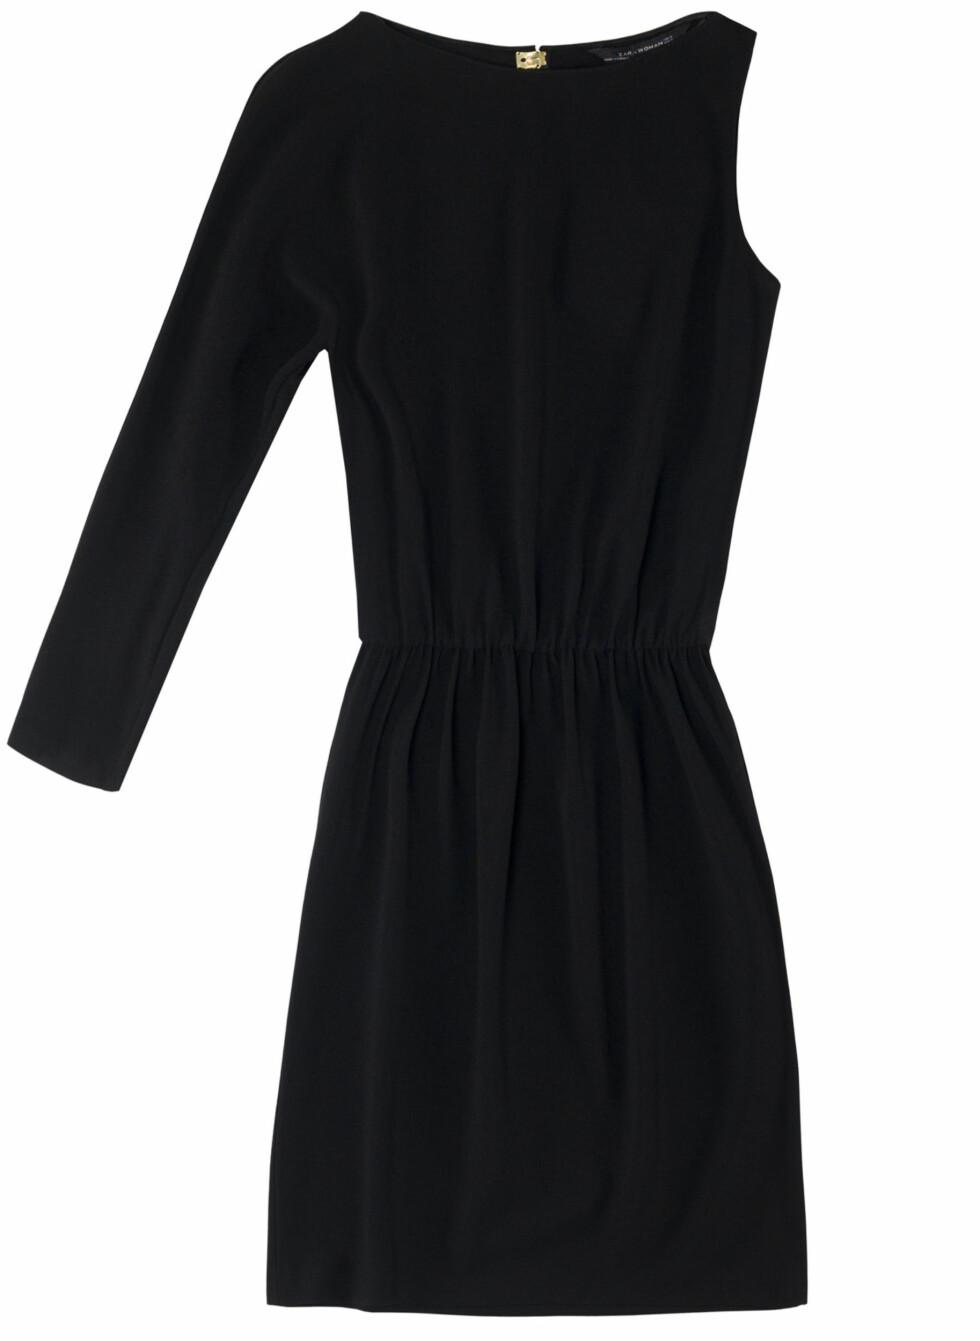 Sort one shoulder-kjole (Kr.599) Foto: Zara